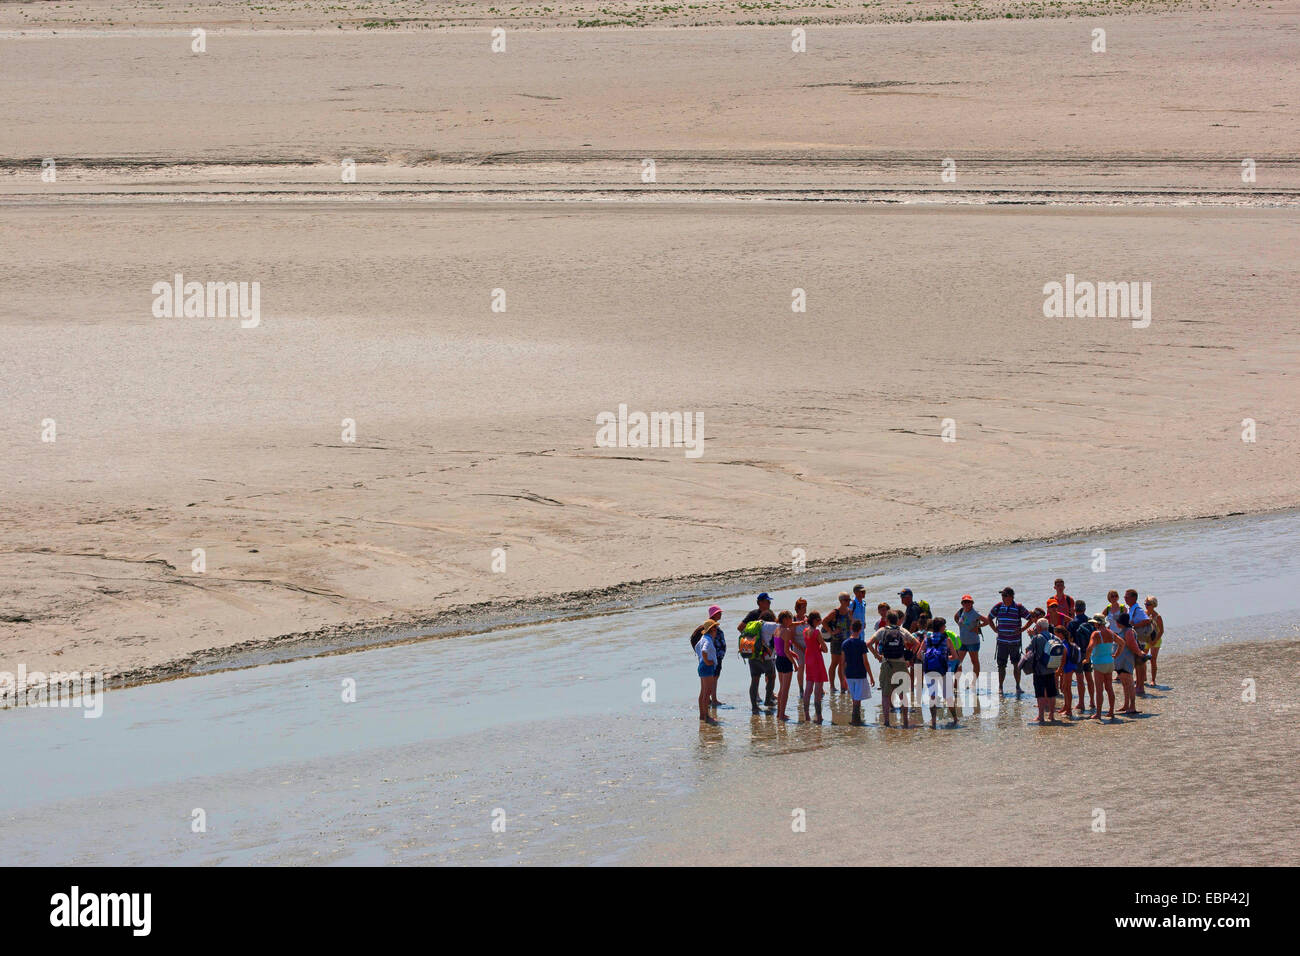 tidal flat hiking at low tide on sandy tideland, France, Brittany - Stock Image